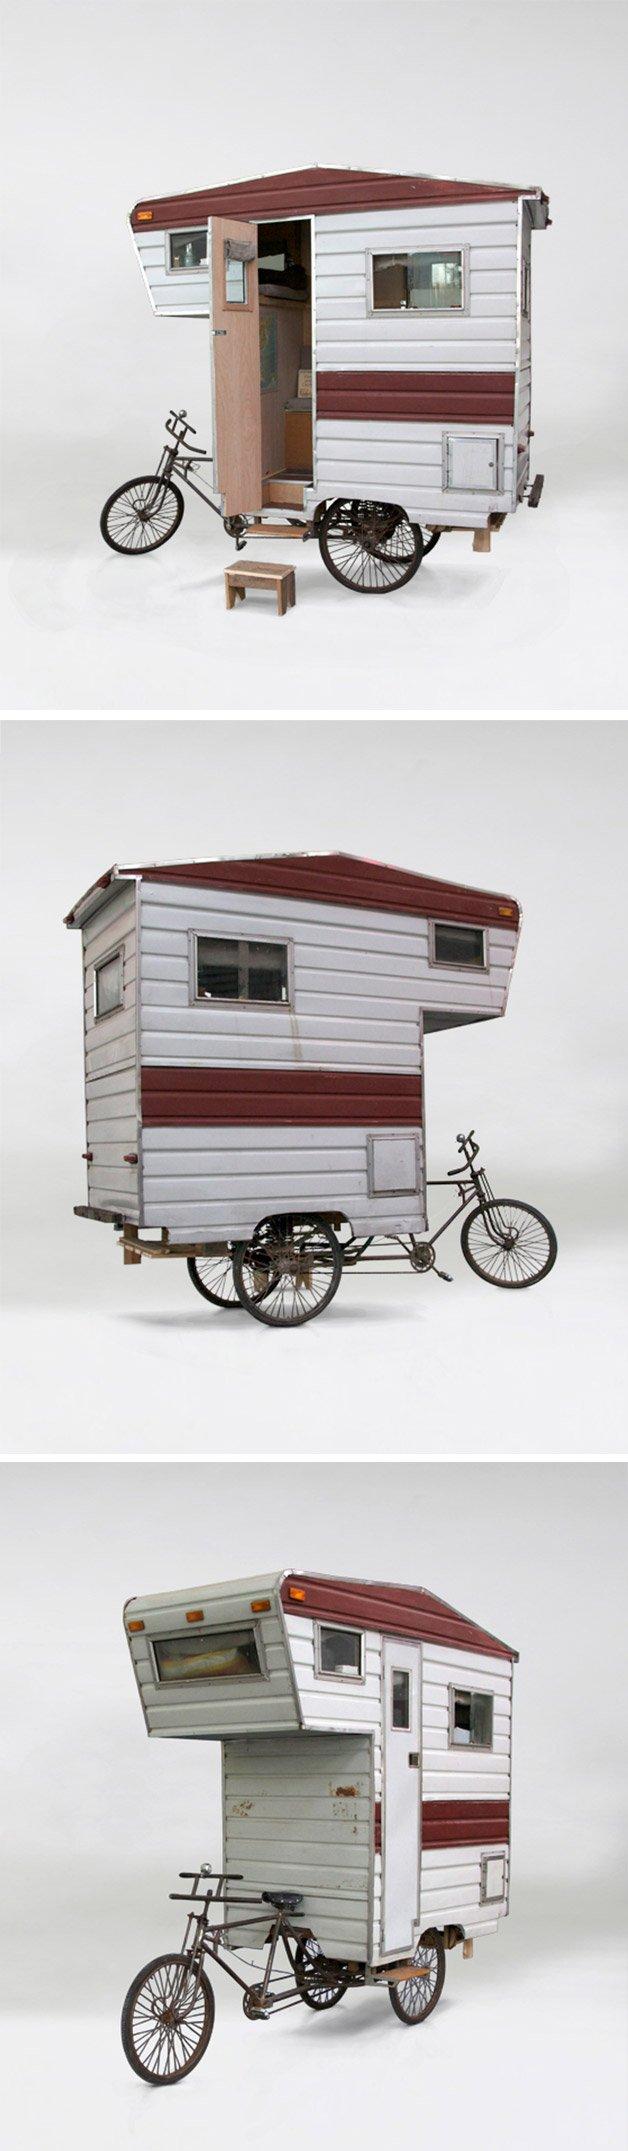 camperbike-interna